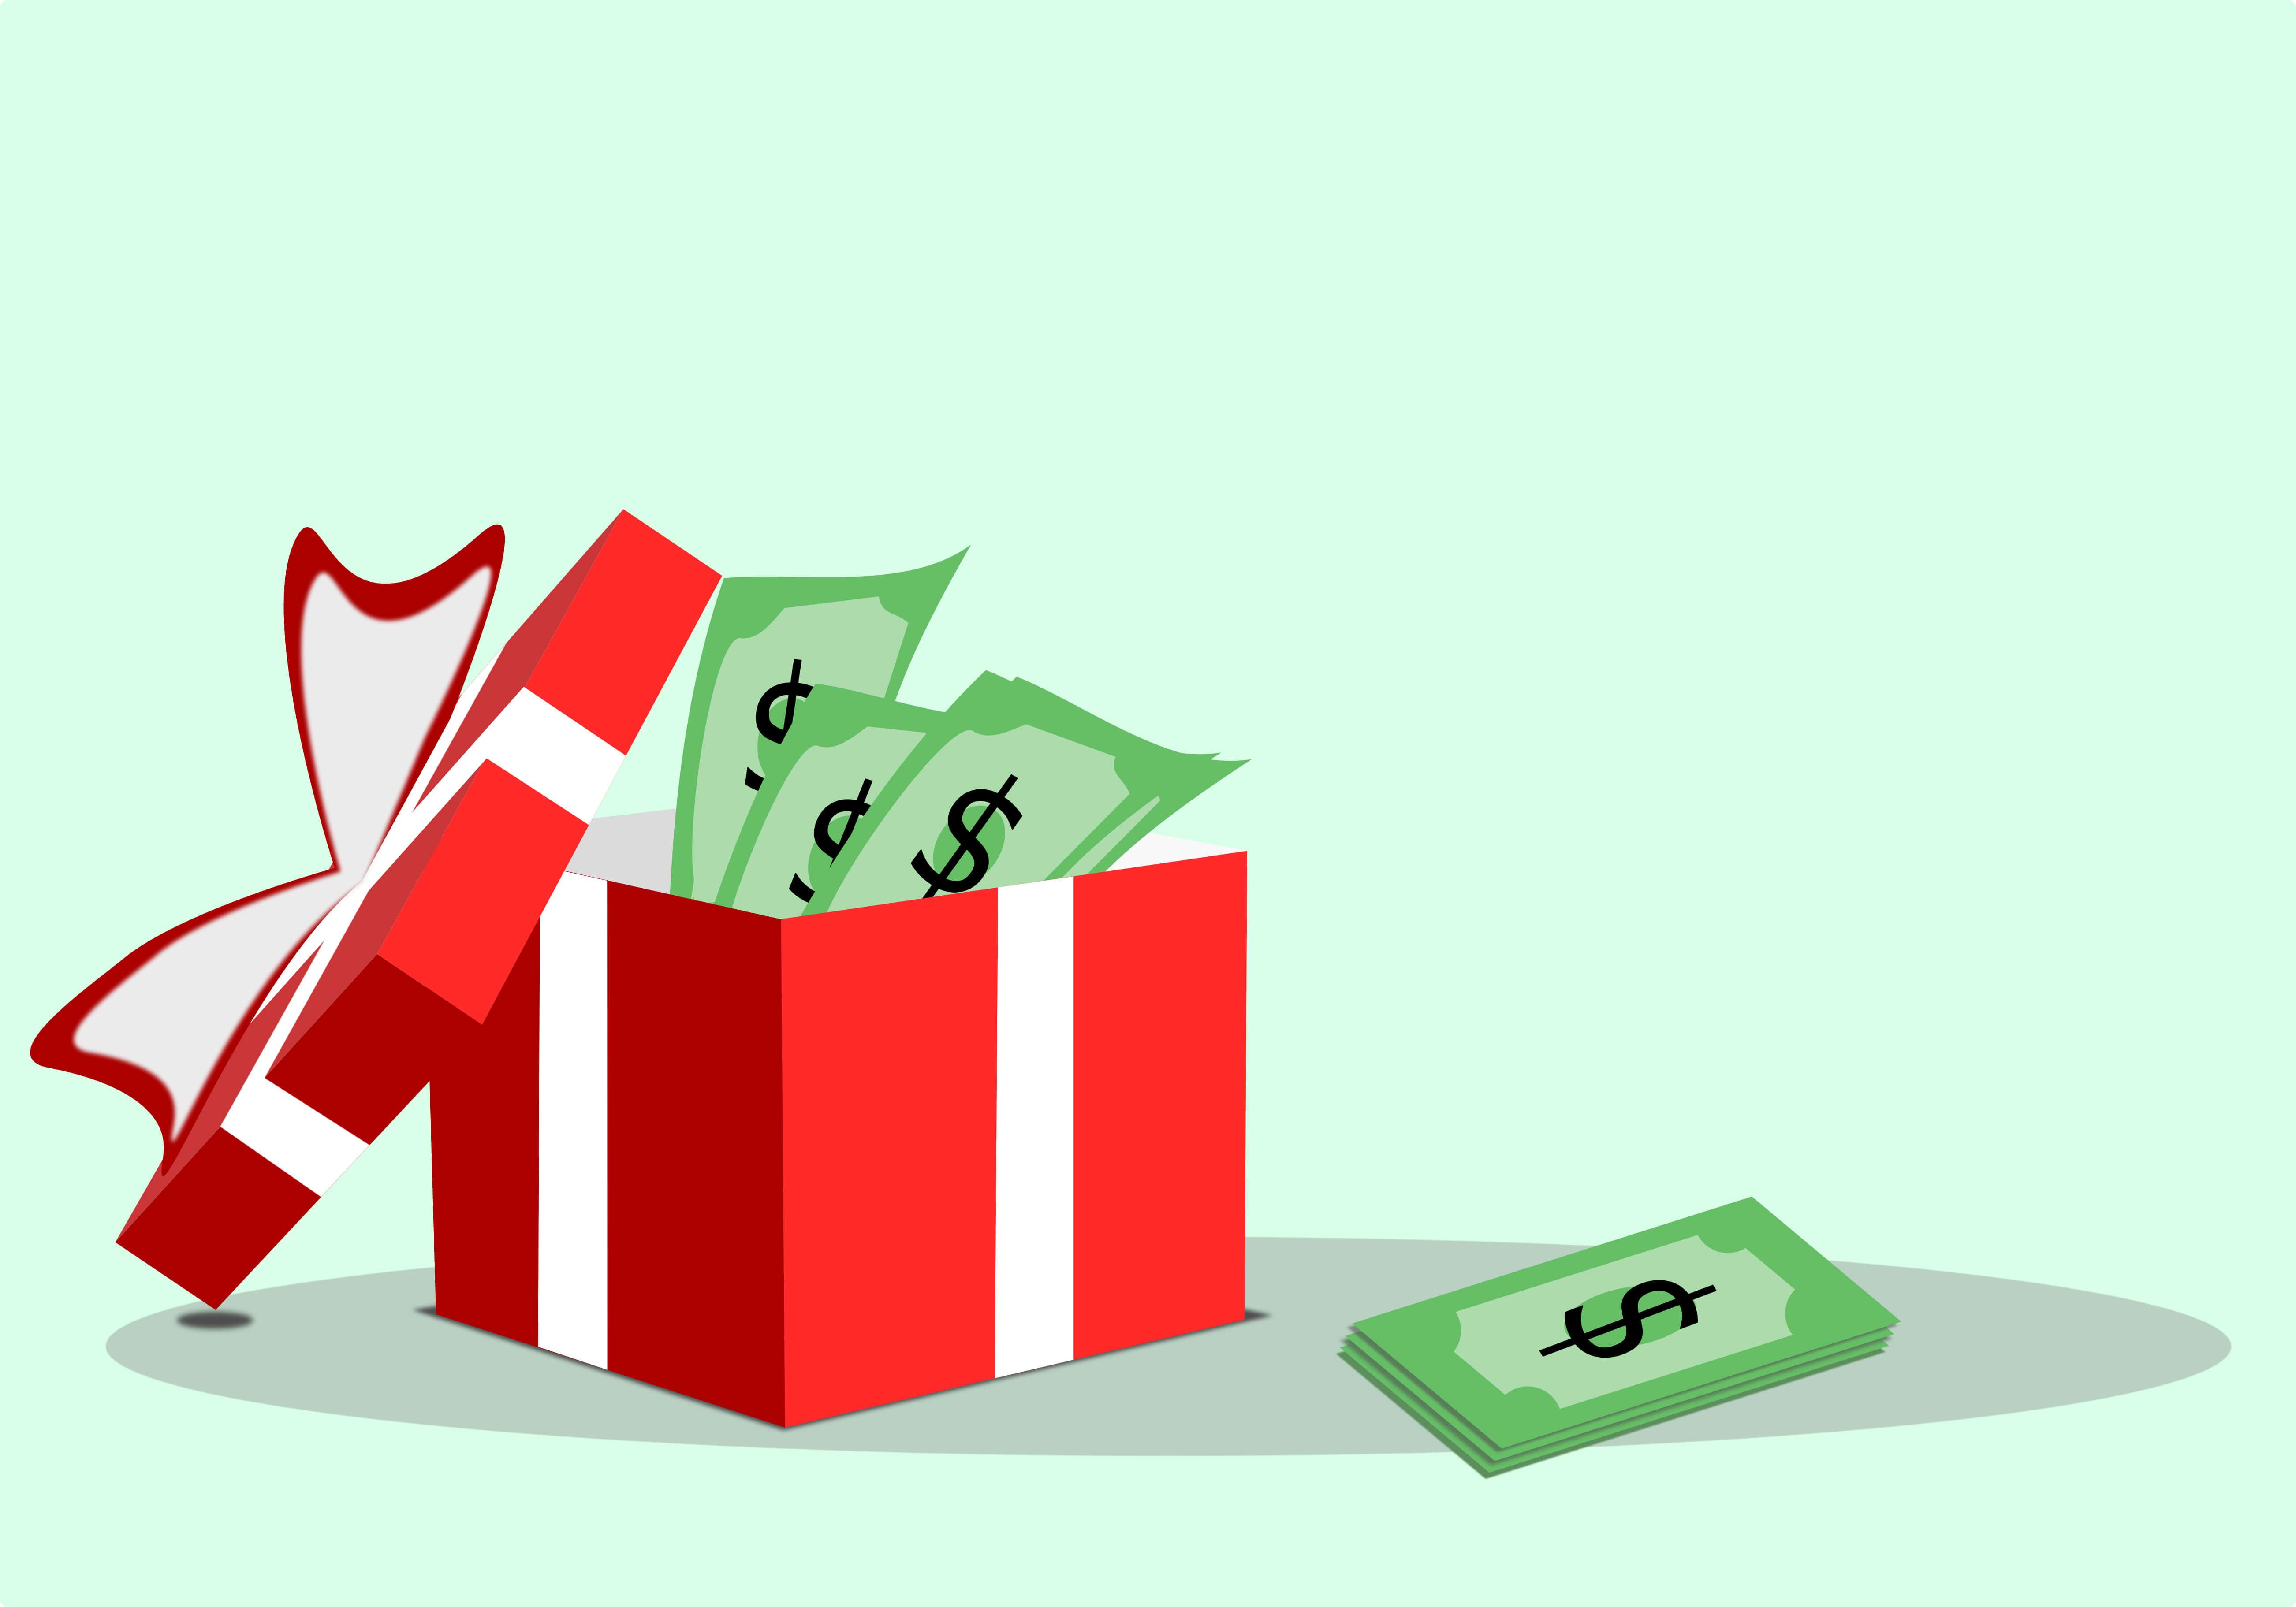 Alpari Cashback Promotion $5 back on every Trade - Up to $10,000